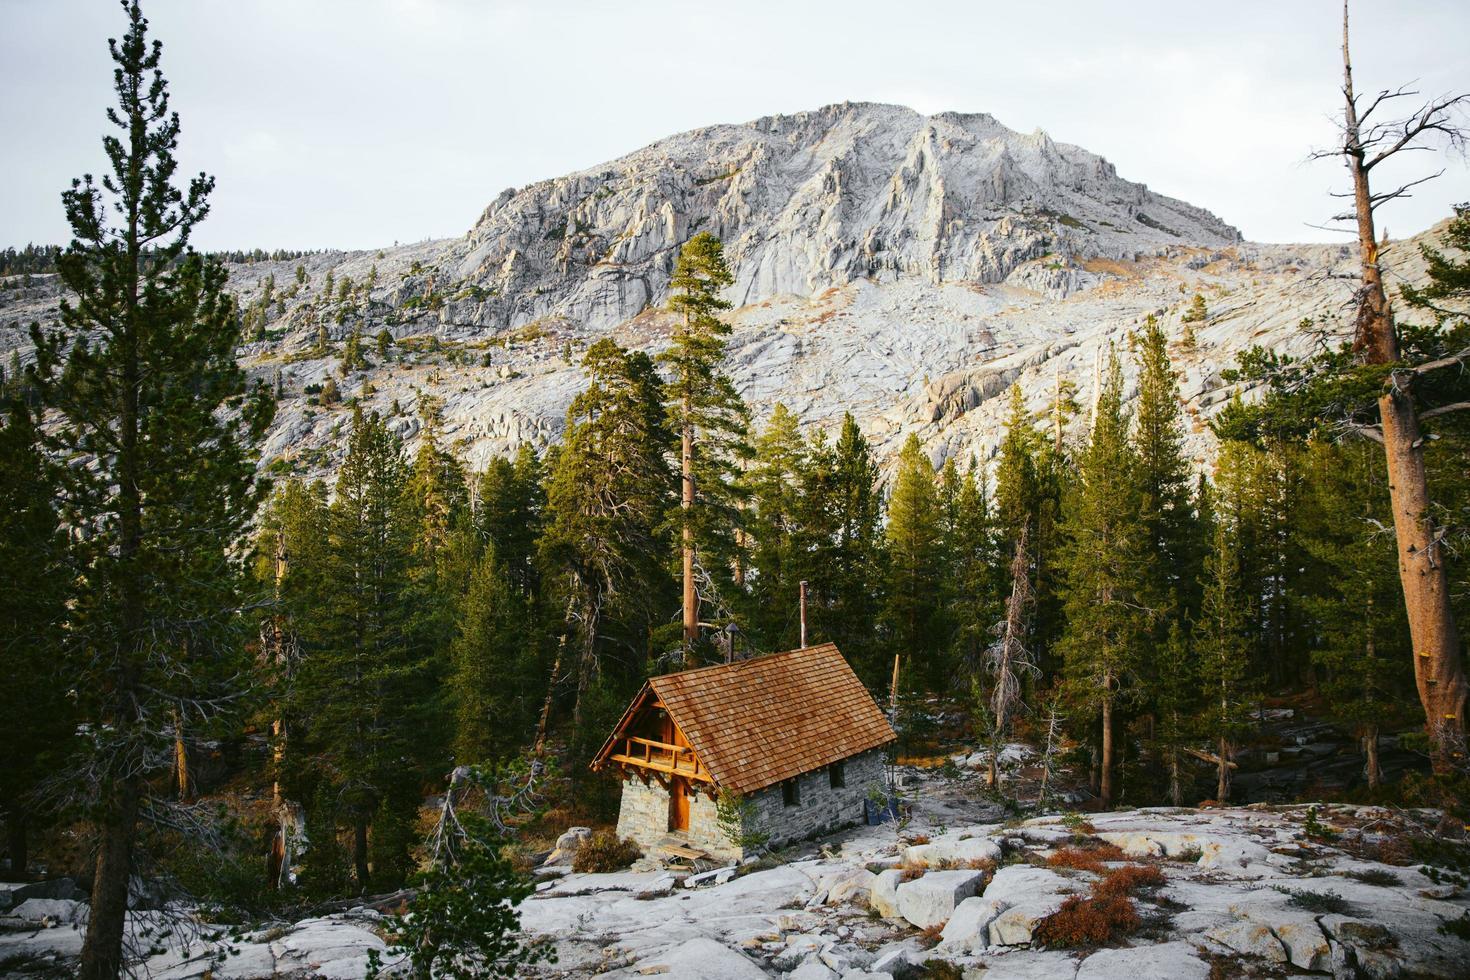 Cabin in the alpine photo